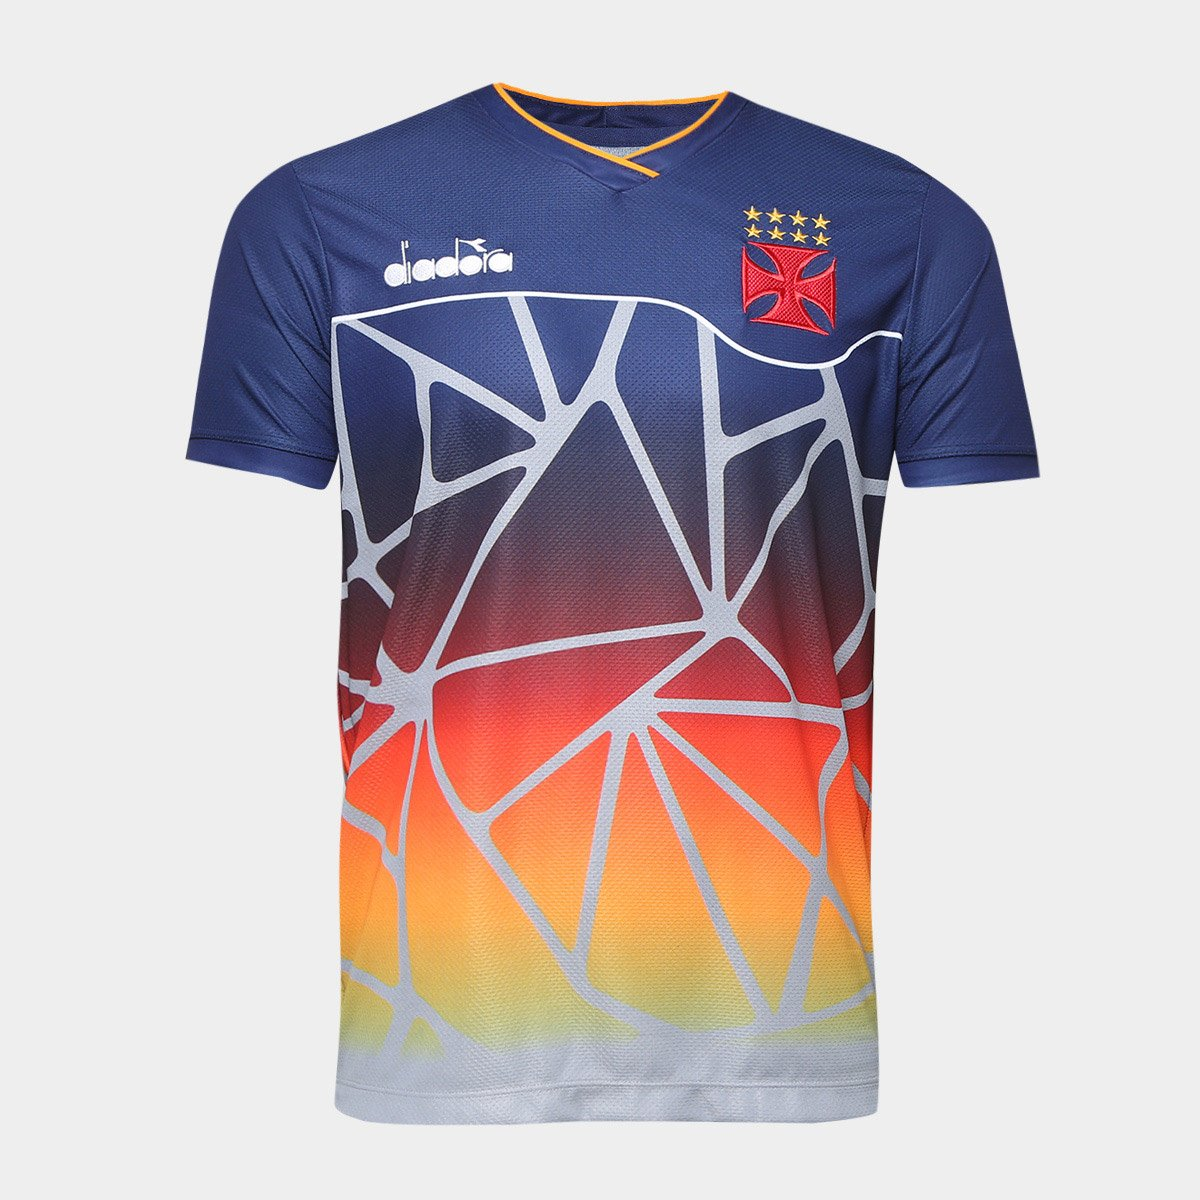 9486dc7f4c Camisa Vasco Treino 2018 Atleta Diadora Masculina | Shop Vasco